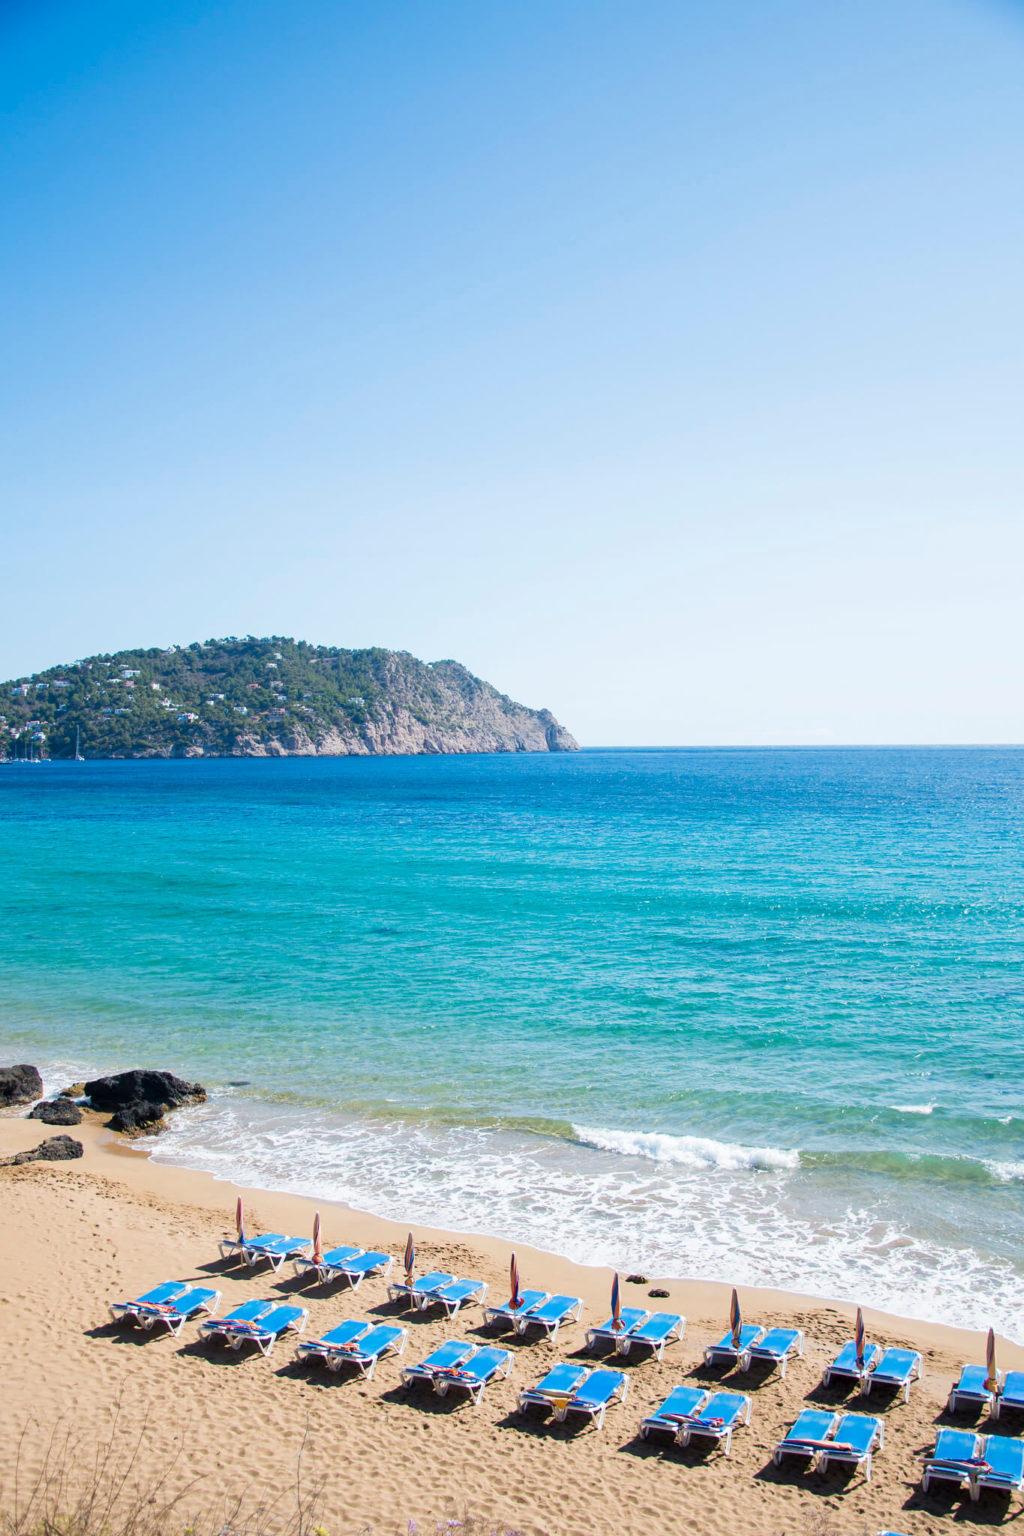 https://www.white-ibiza.com/wp-content/uploads/2020/03/ibiza-beaches-aguas-blancas-03-1024x1536.jpg